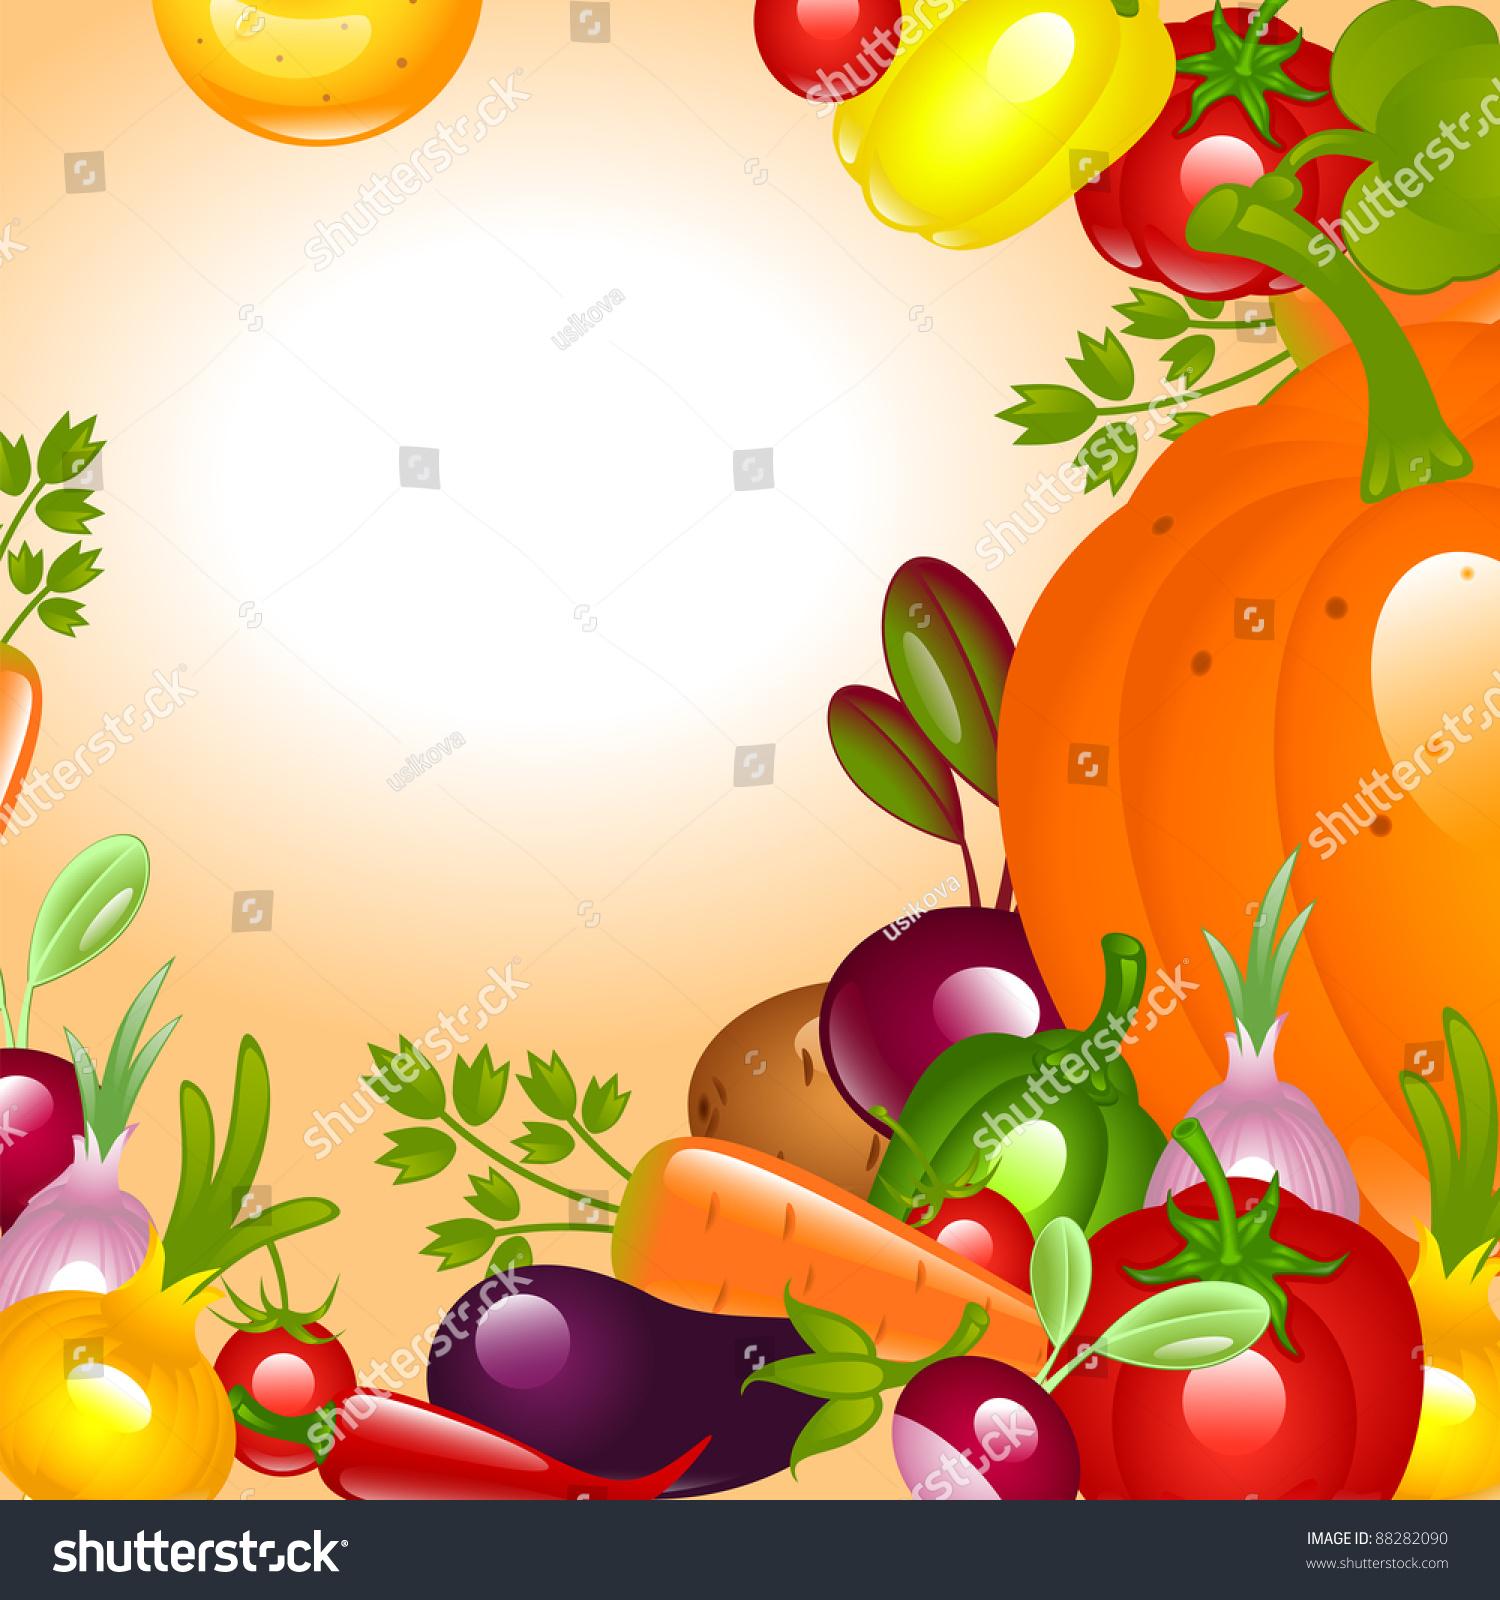 Banner Thanksgiving Vegetables Background Stock Vector 88282090 ...